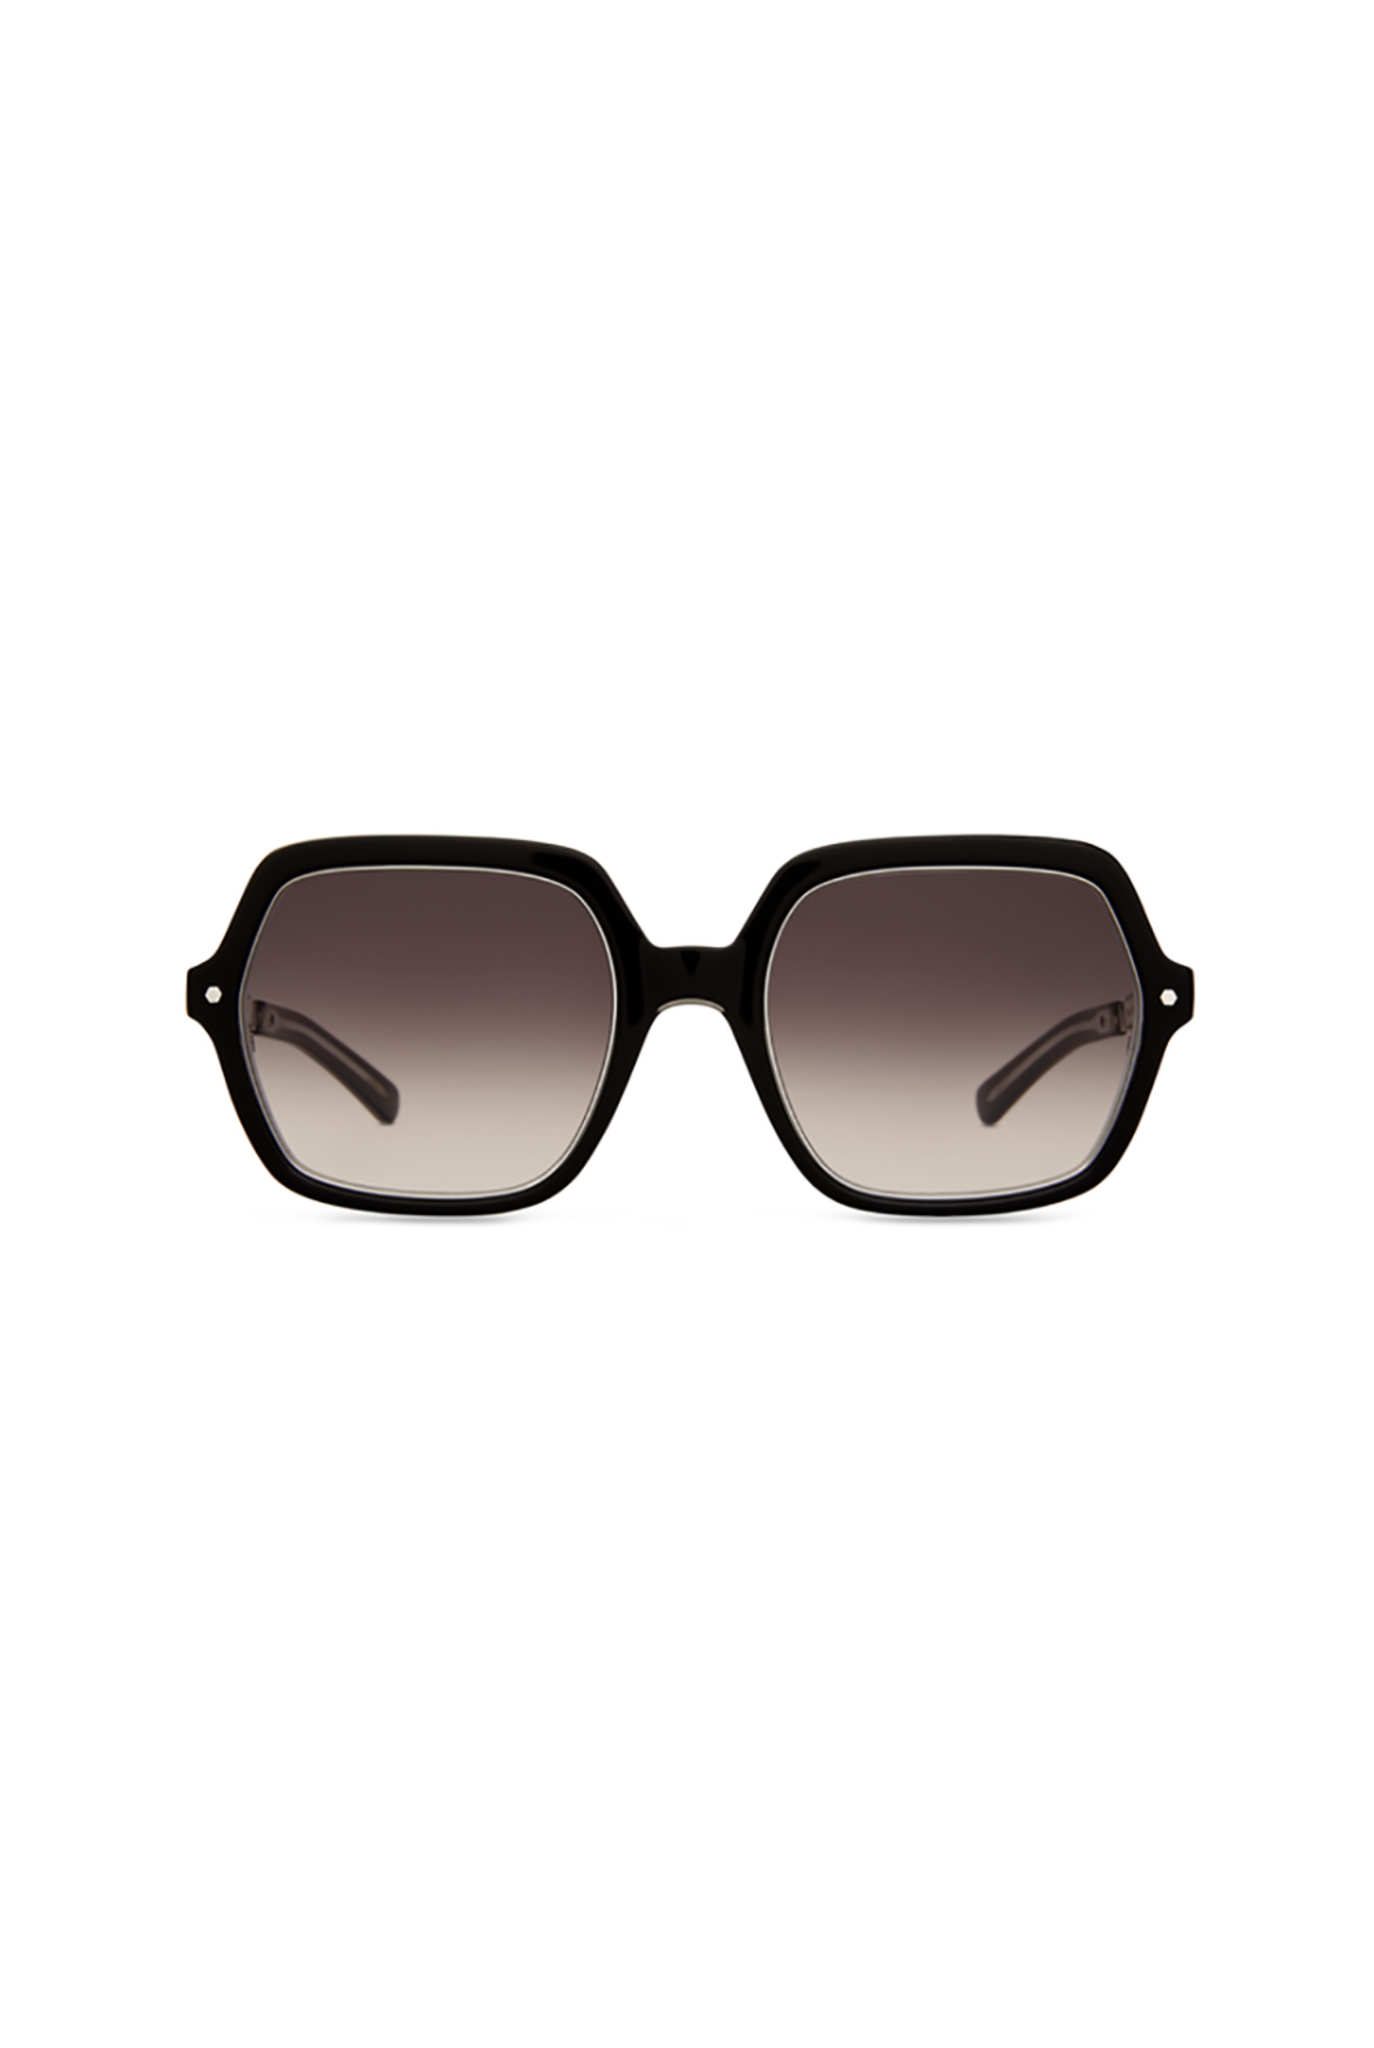 Sofia S56 Black Glass-Platinum/Black Gradient